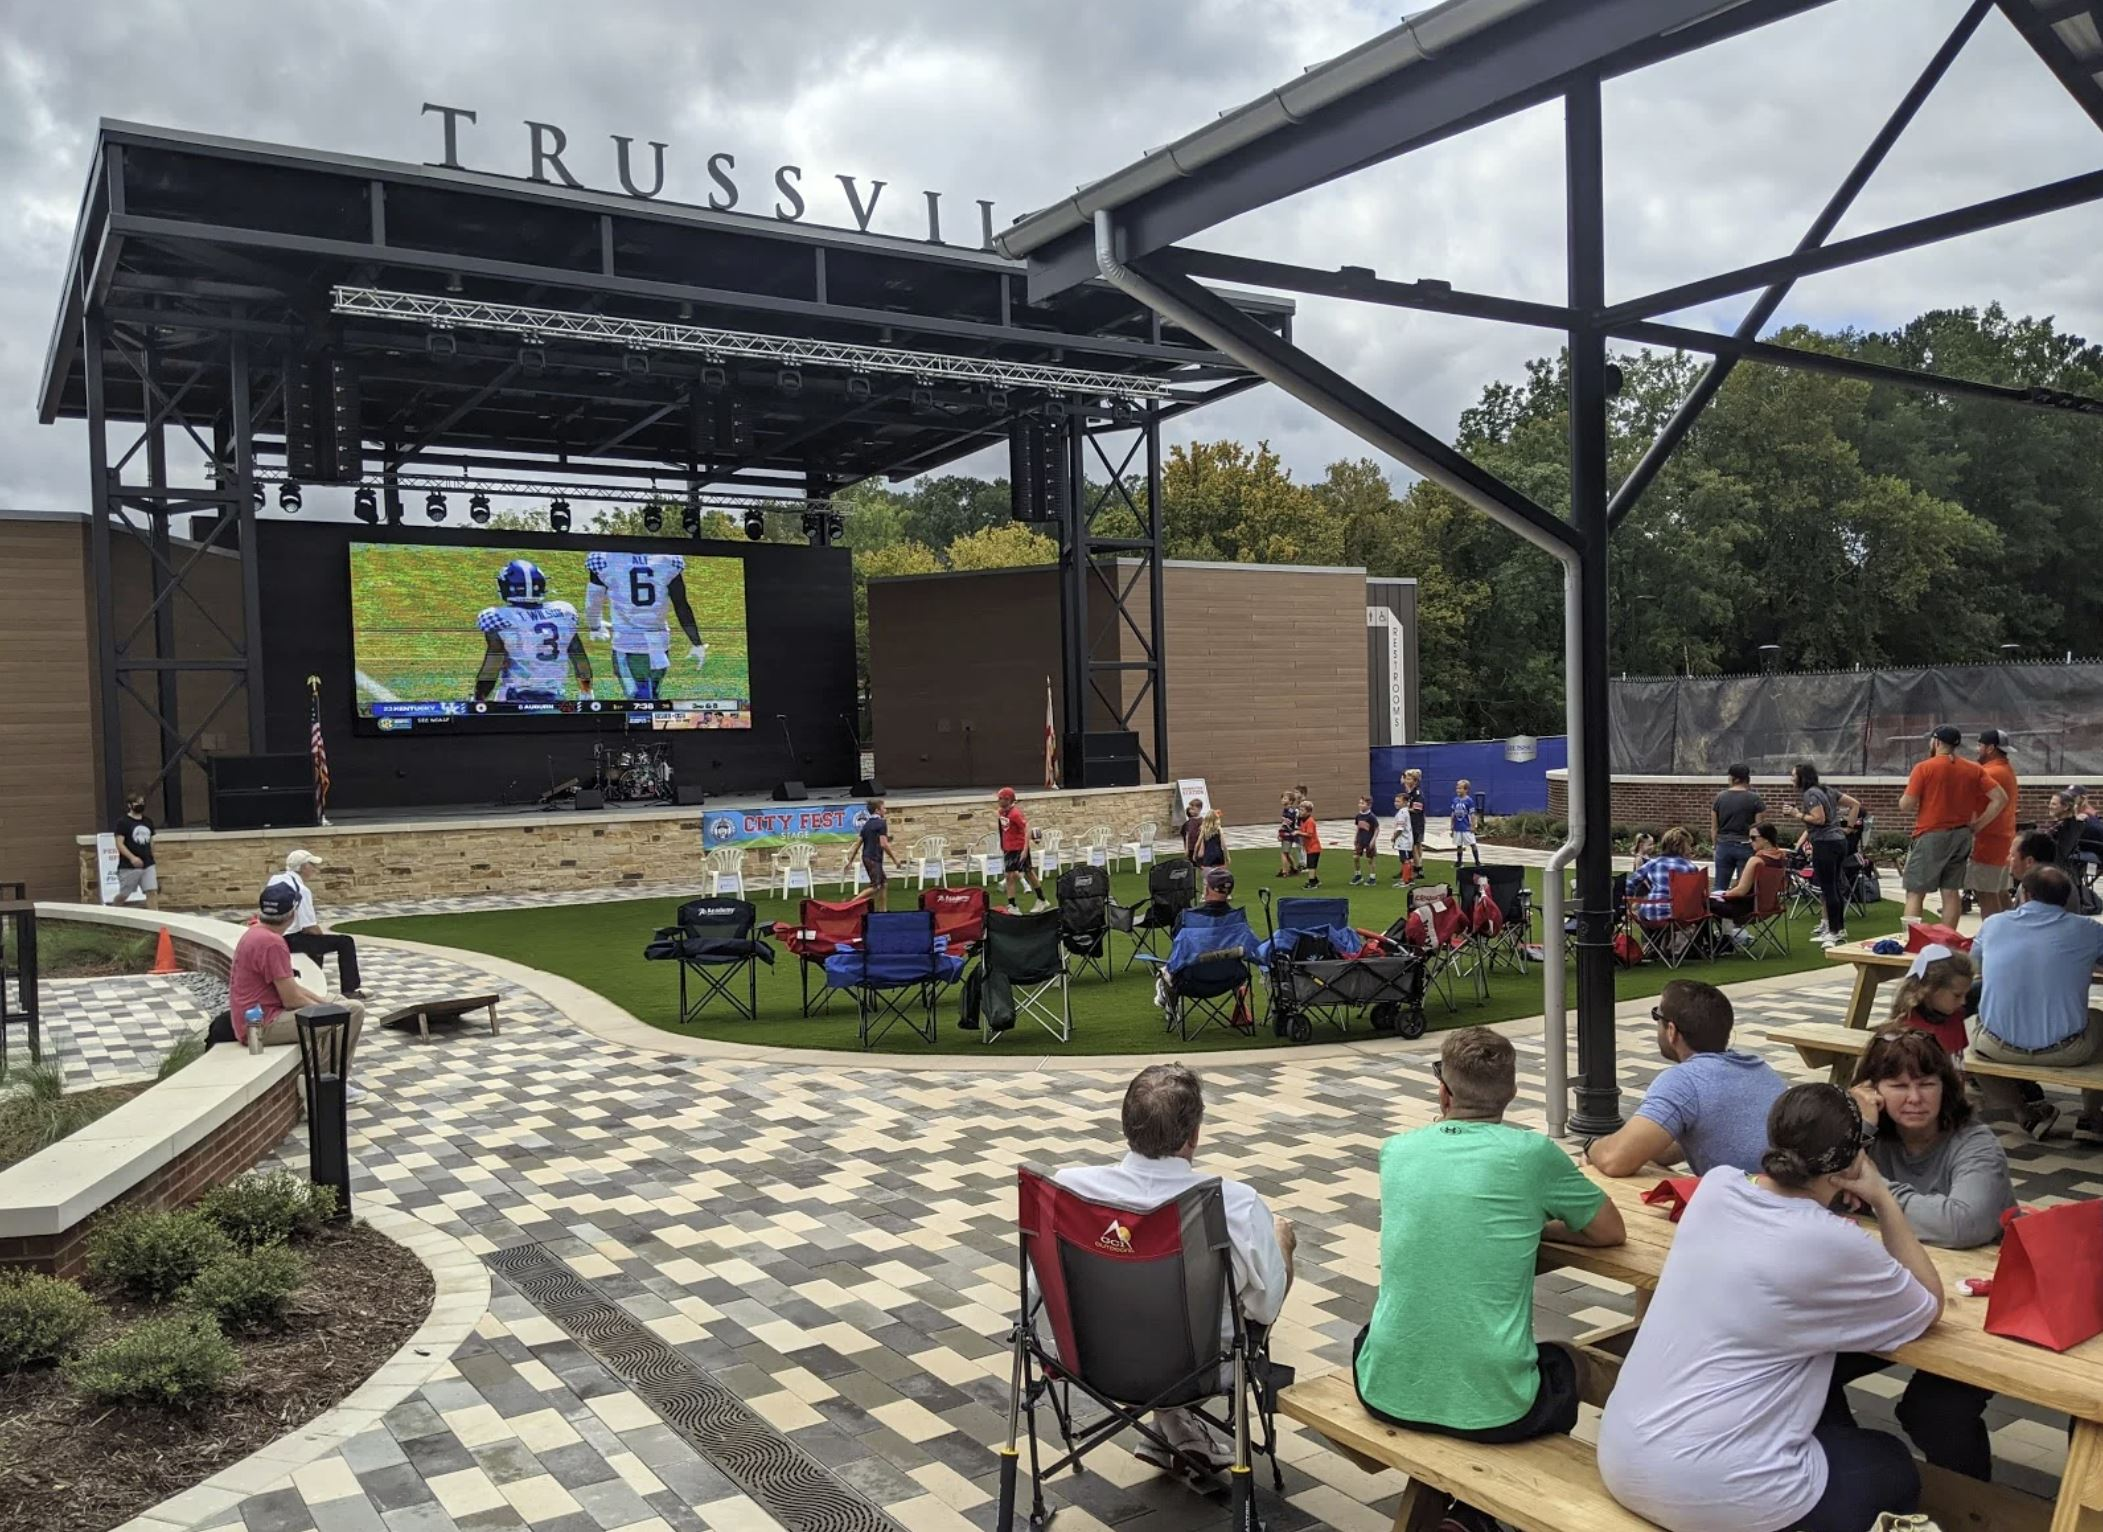 Trussville's new entertainment district featured in MediaMerge blog